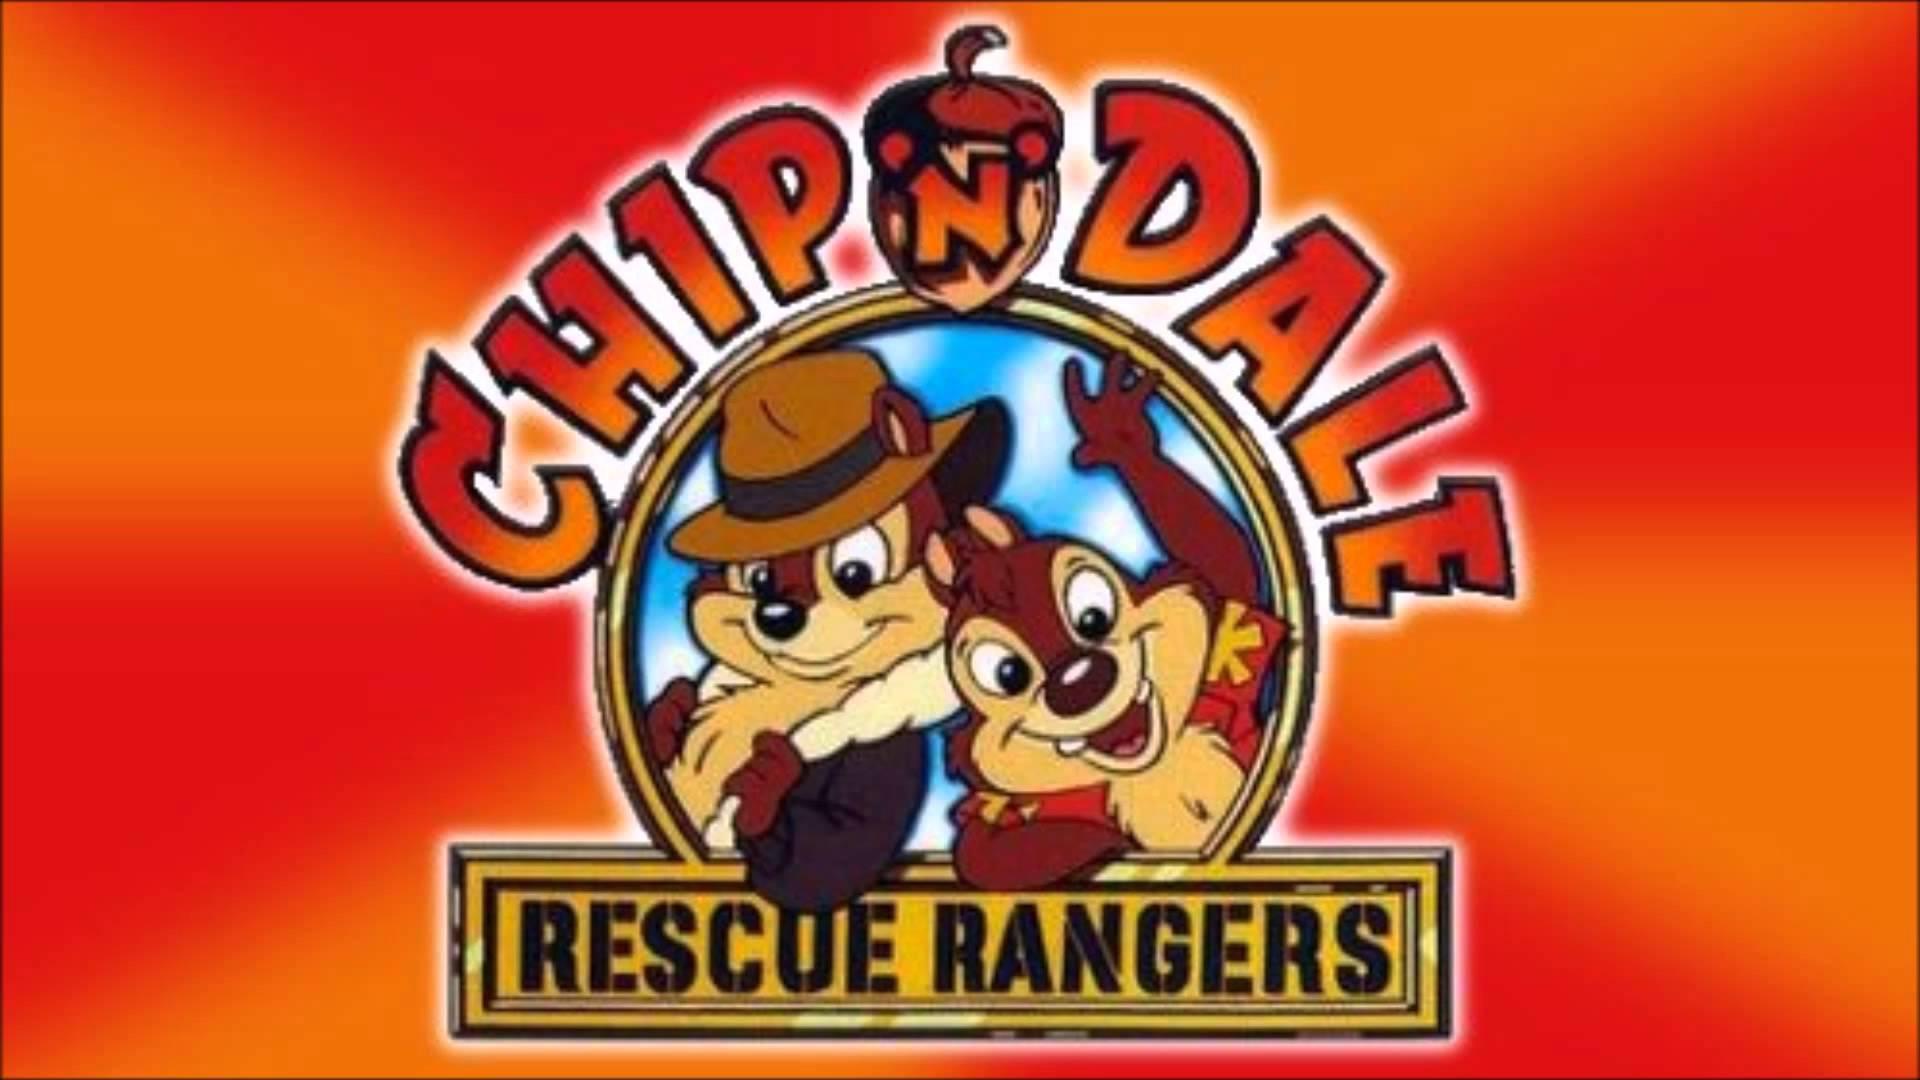 Chip n Dale - 90s Cartoons